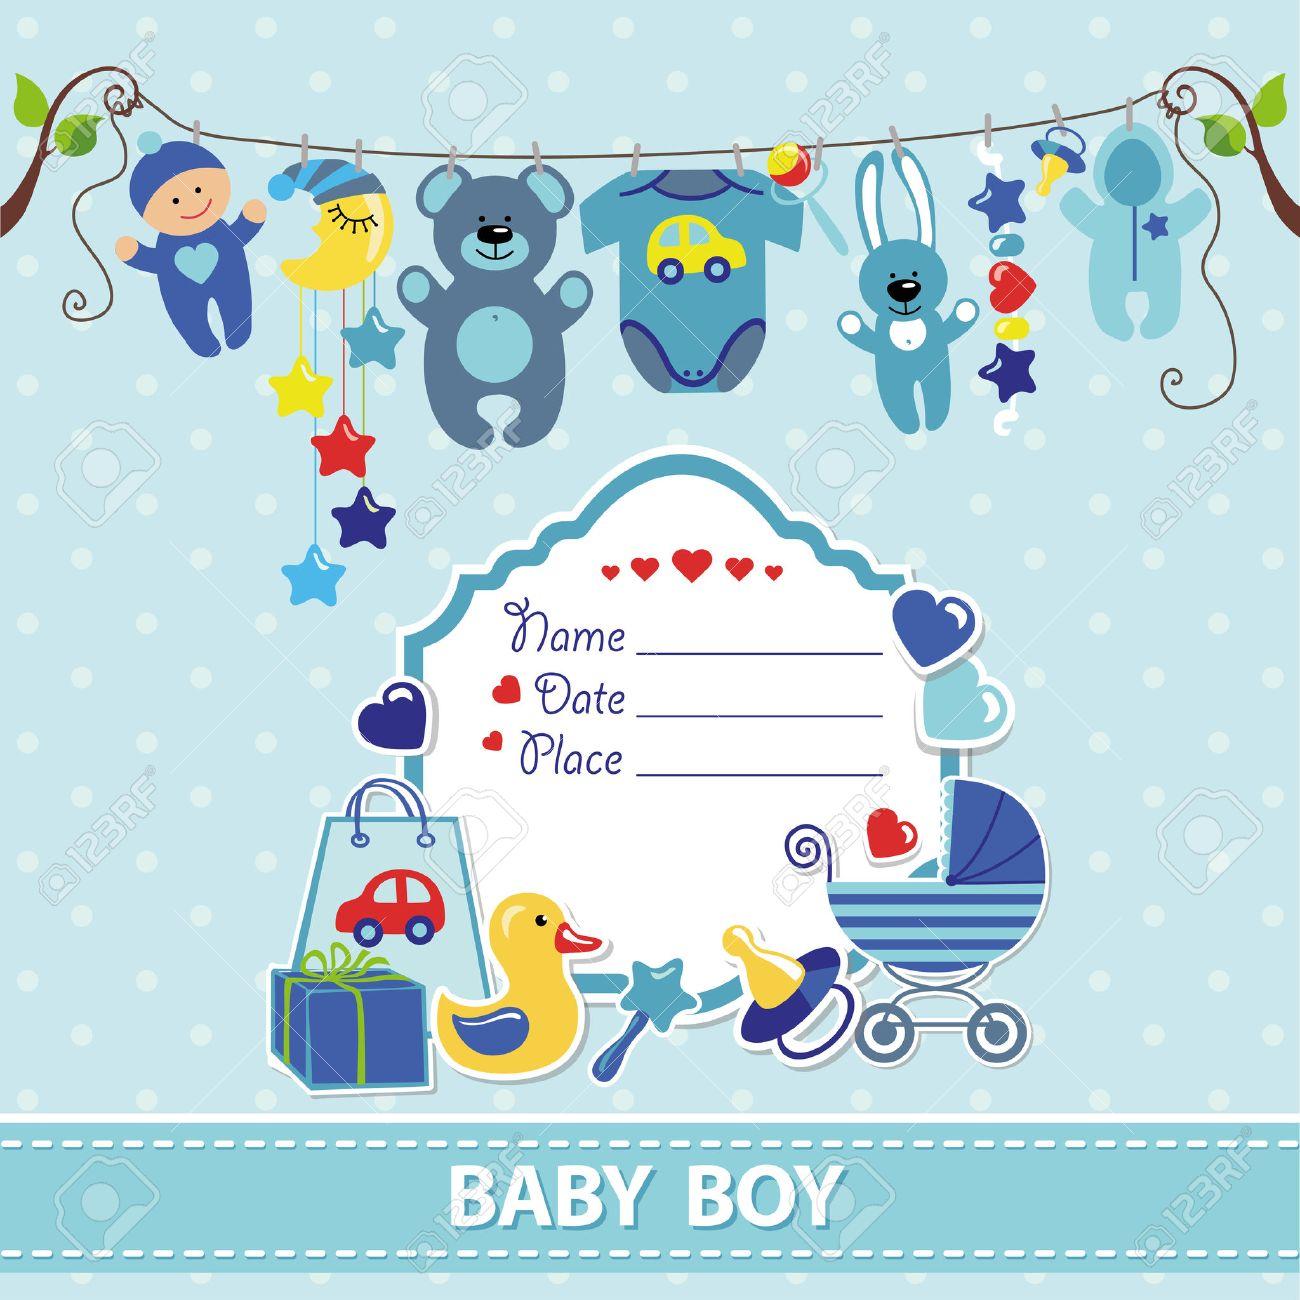 New born Baby boy invitation shower card.Flat elements hanging on rope,label,stork.Vector scrapbook decor.Greeting pstcard.Blue,cyan colors,polka dot background.Design template. - 54430771